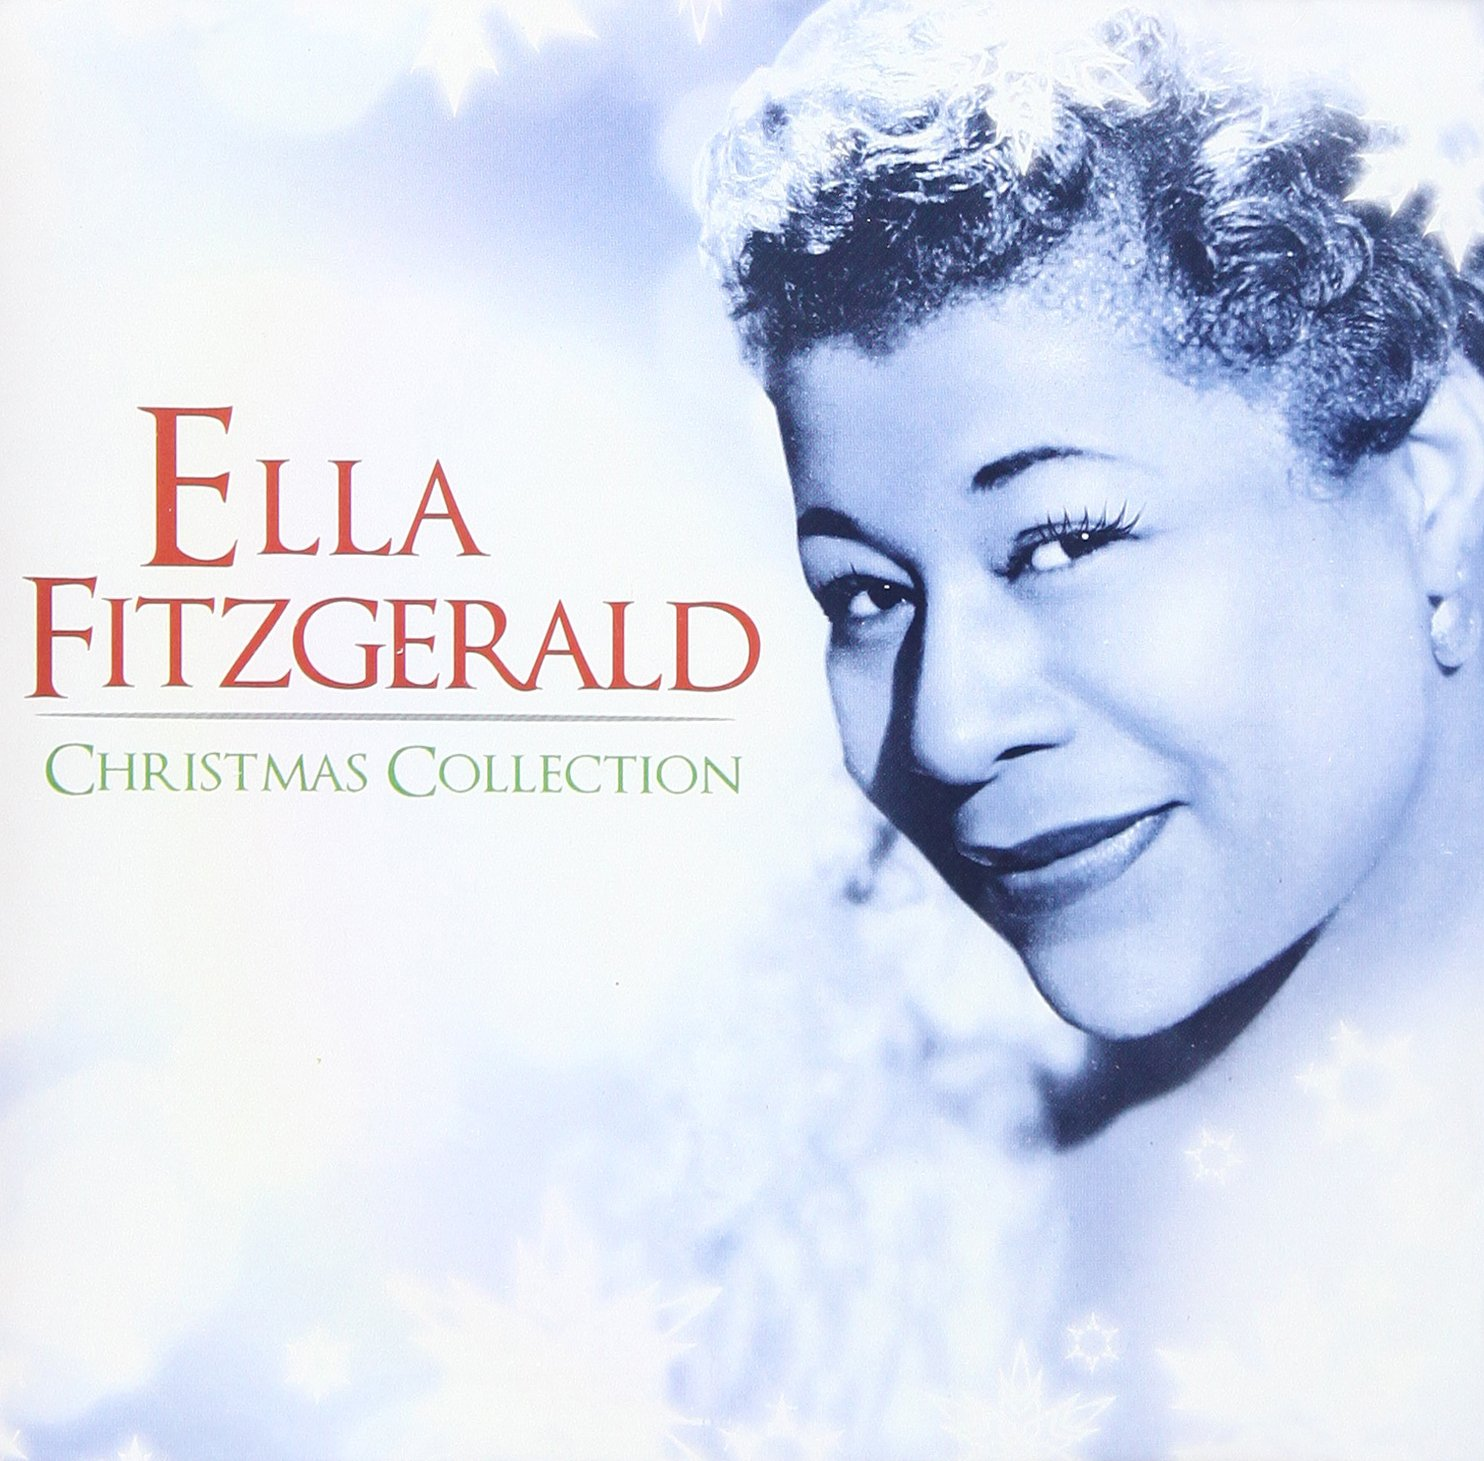 Ella Fitzgerald - Ella Fitzgerald Christmas Collection - Amazon ...